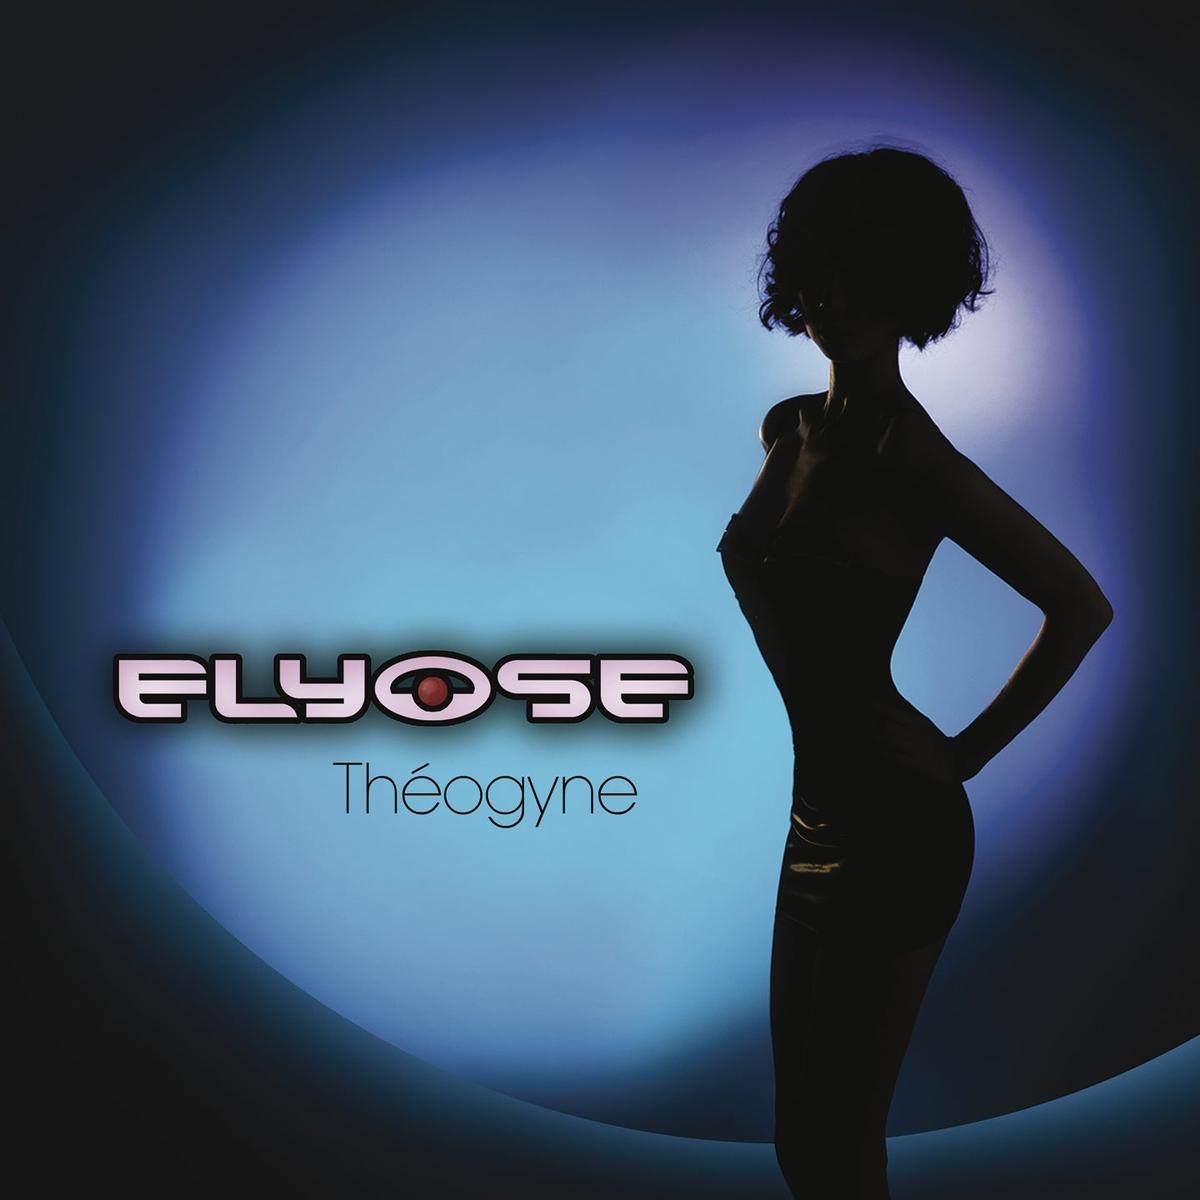 Elyose - Théogyne